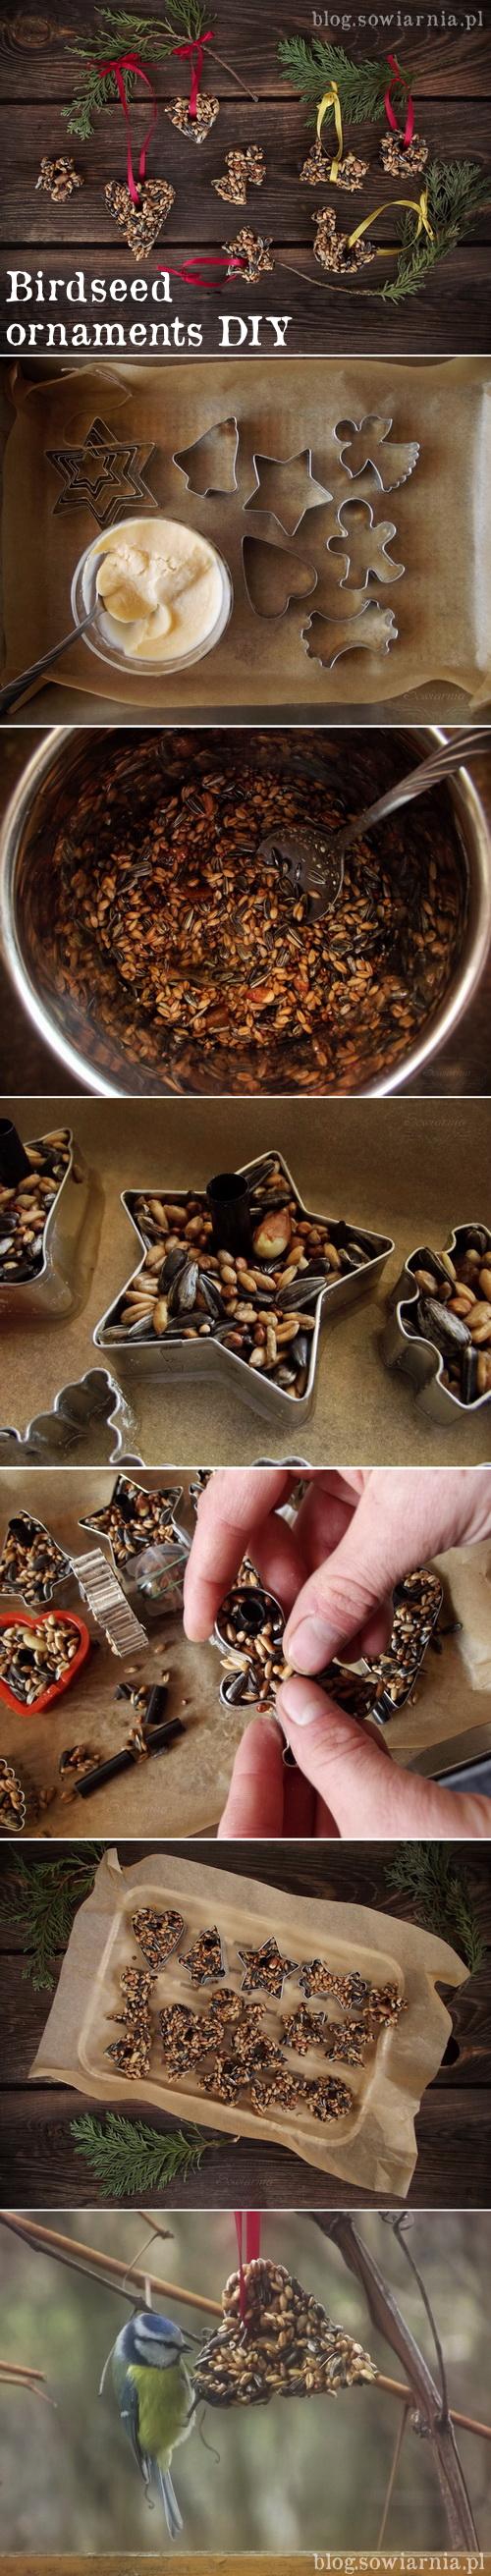 birdseed ornaments tutorial